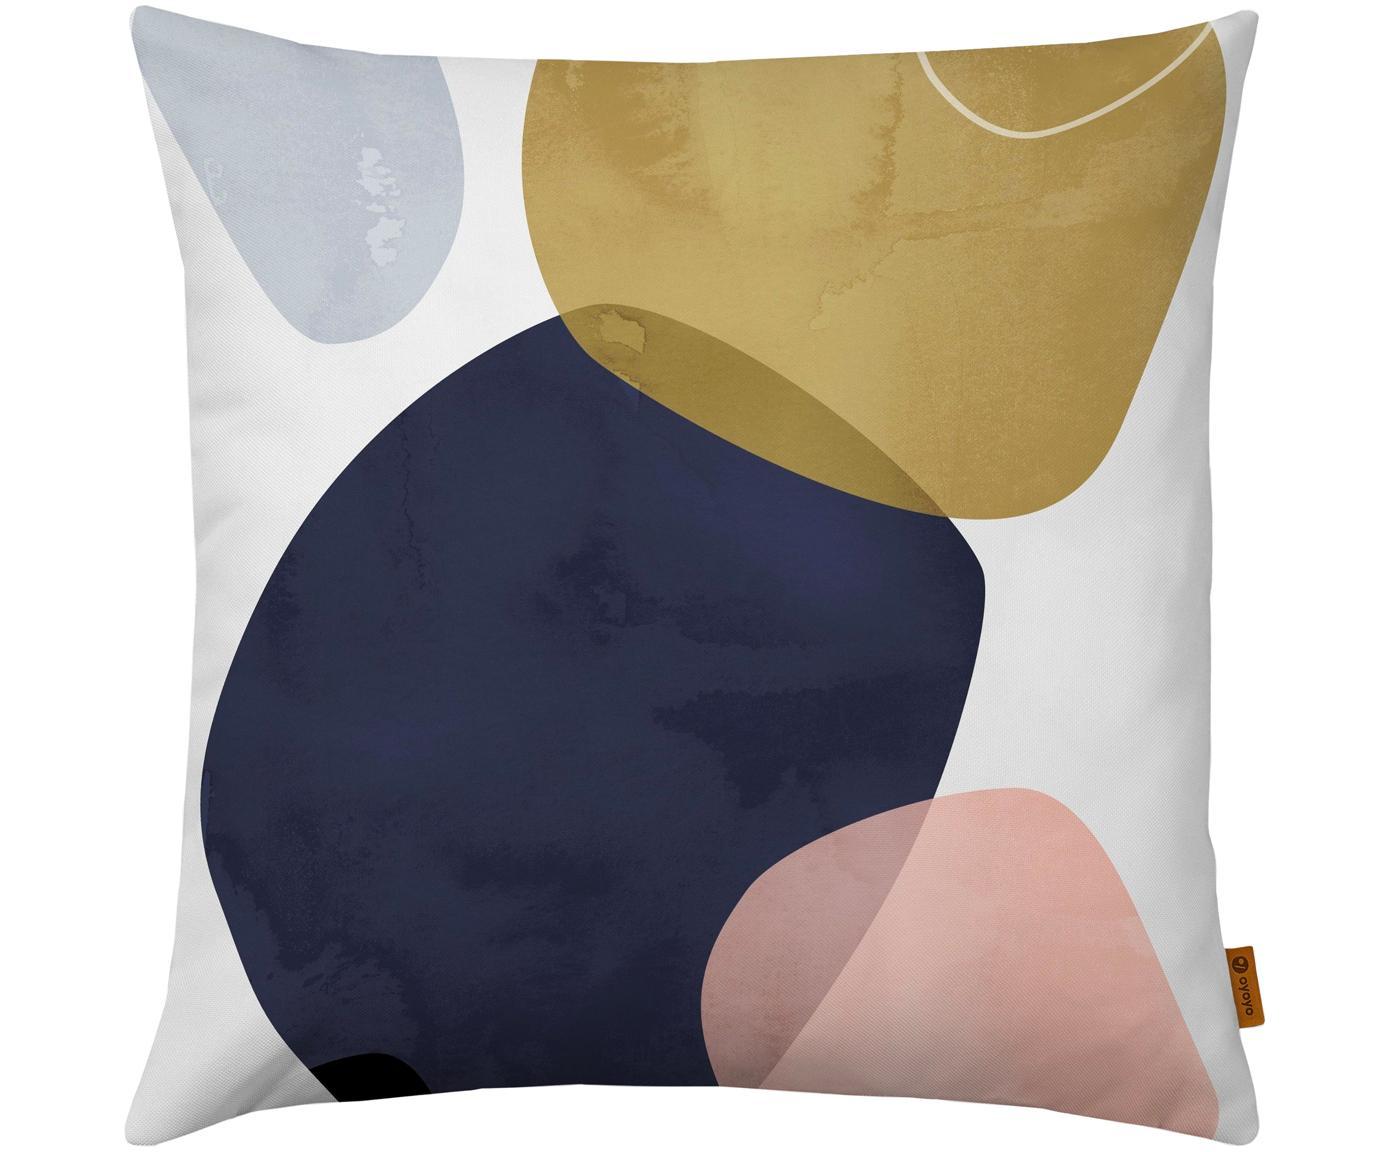 Federa arredo con stampa geometrica Graphic, Poliestere, Blu, oro, bianco, Larg. 40 x Lung. 40 cm